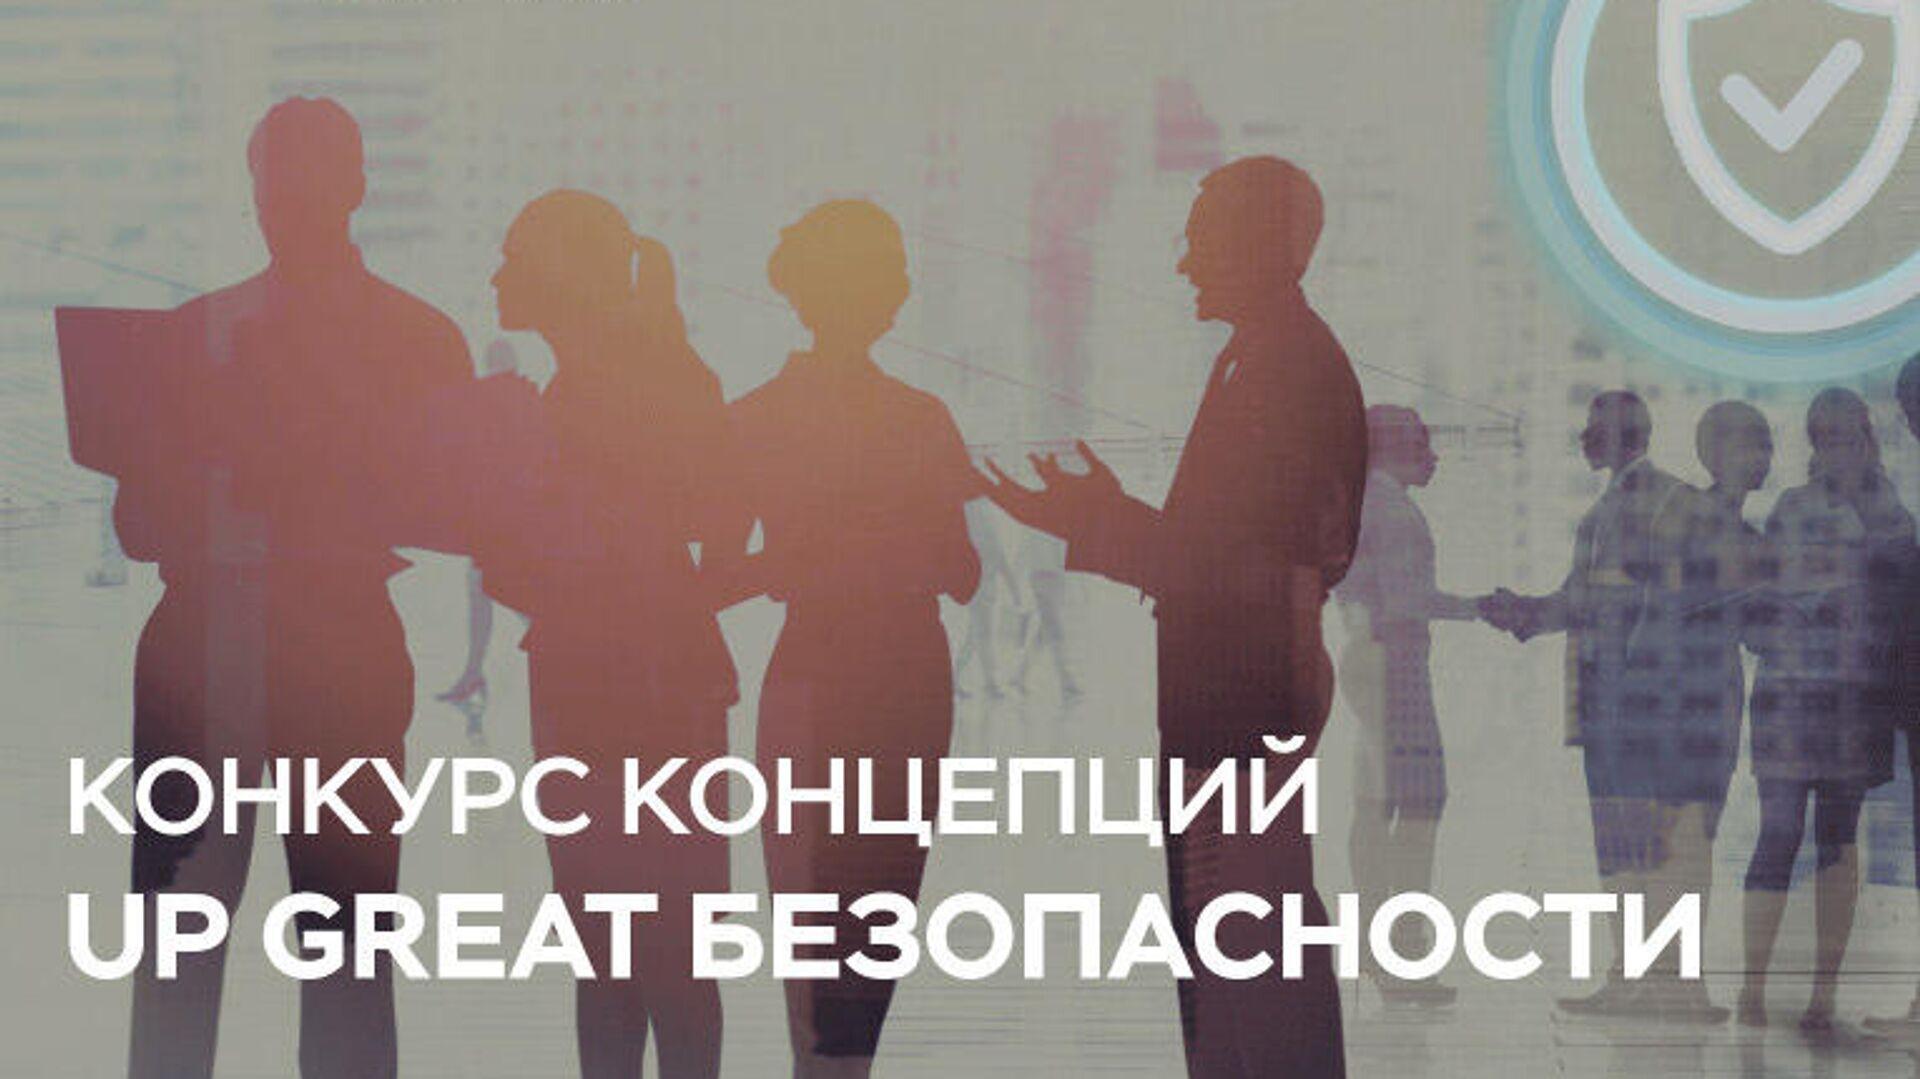 Конкурс концепций Up Great безопасности - РИА Новости, 1920, 24.08.2020